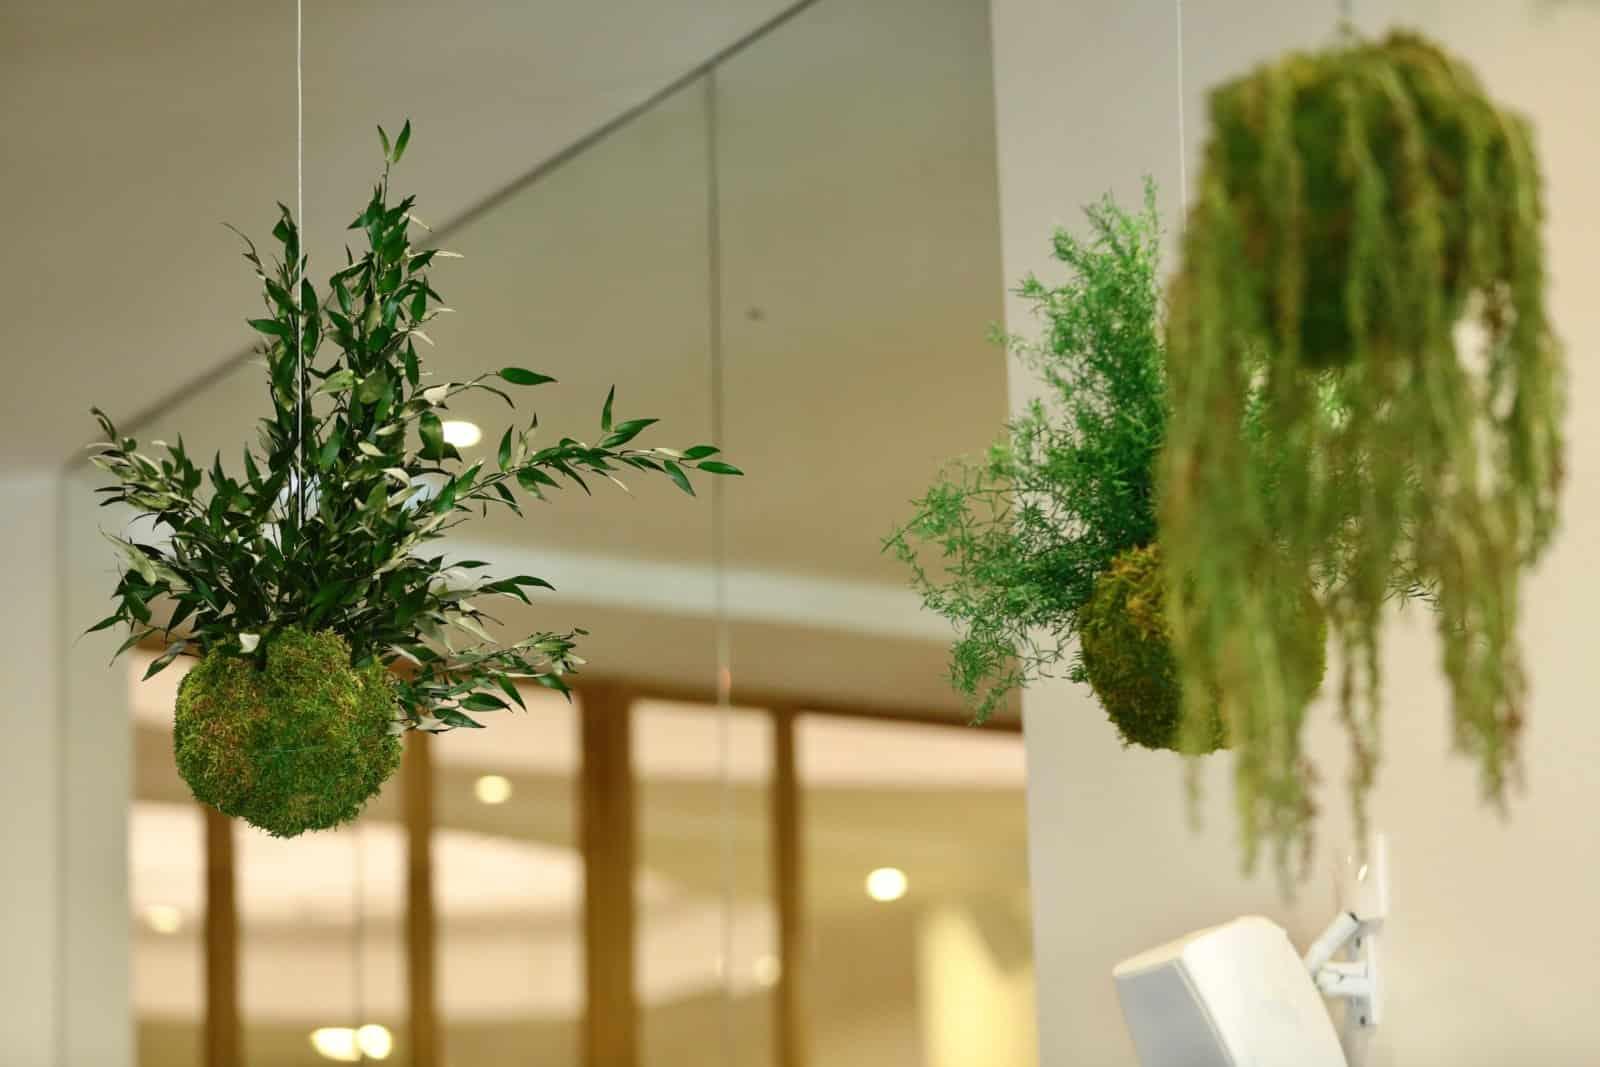 kokedama en entreprise : design végétal par Green Decor